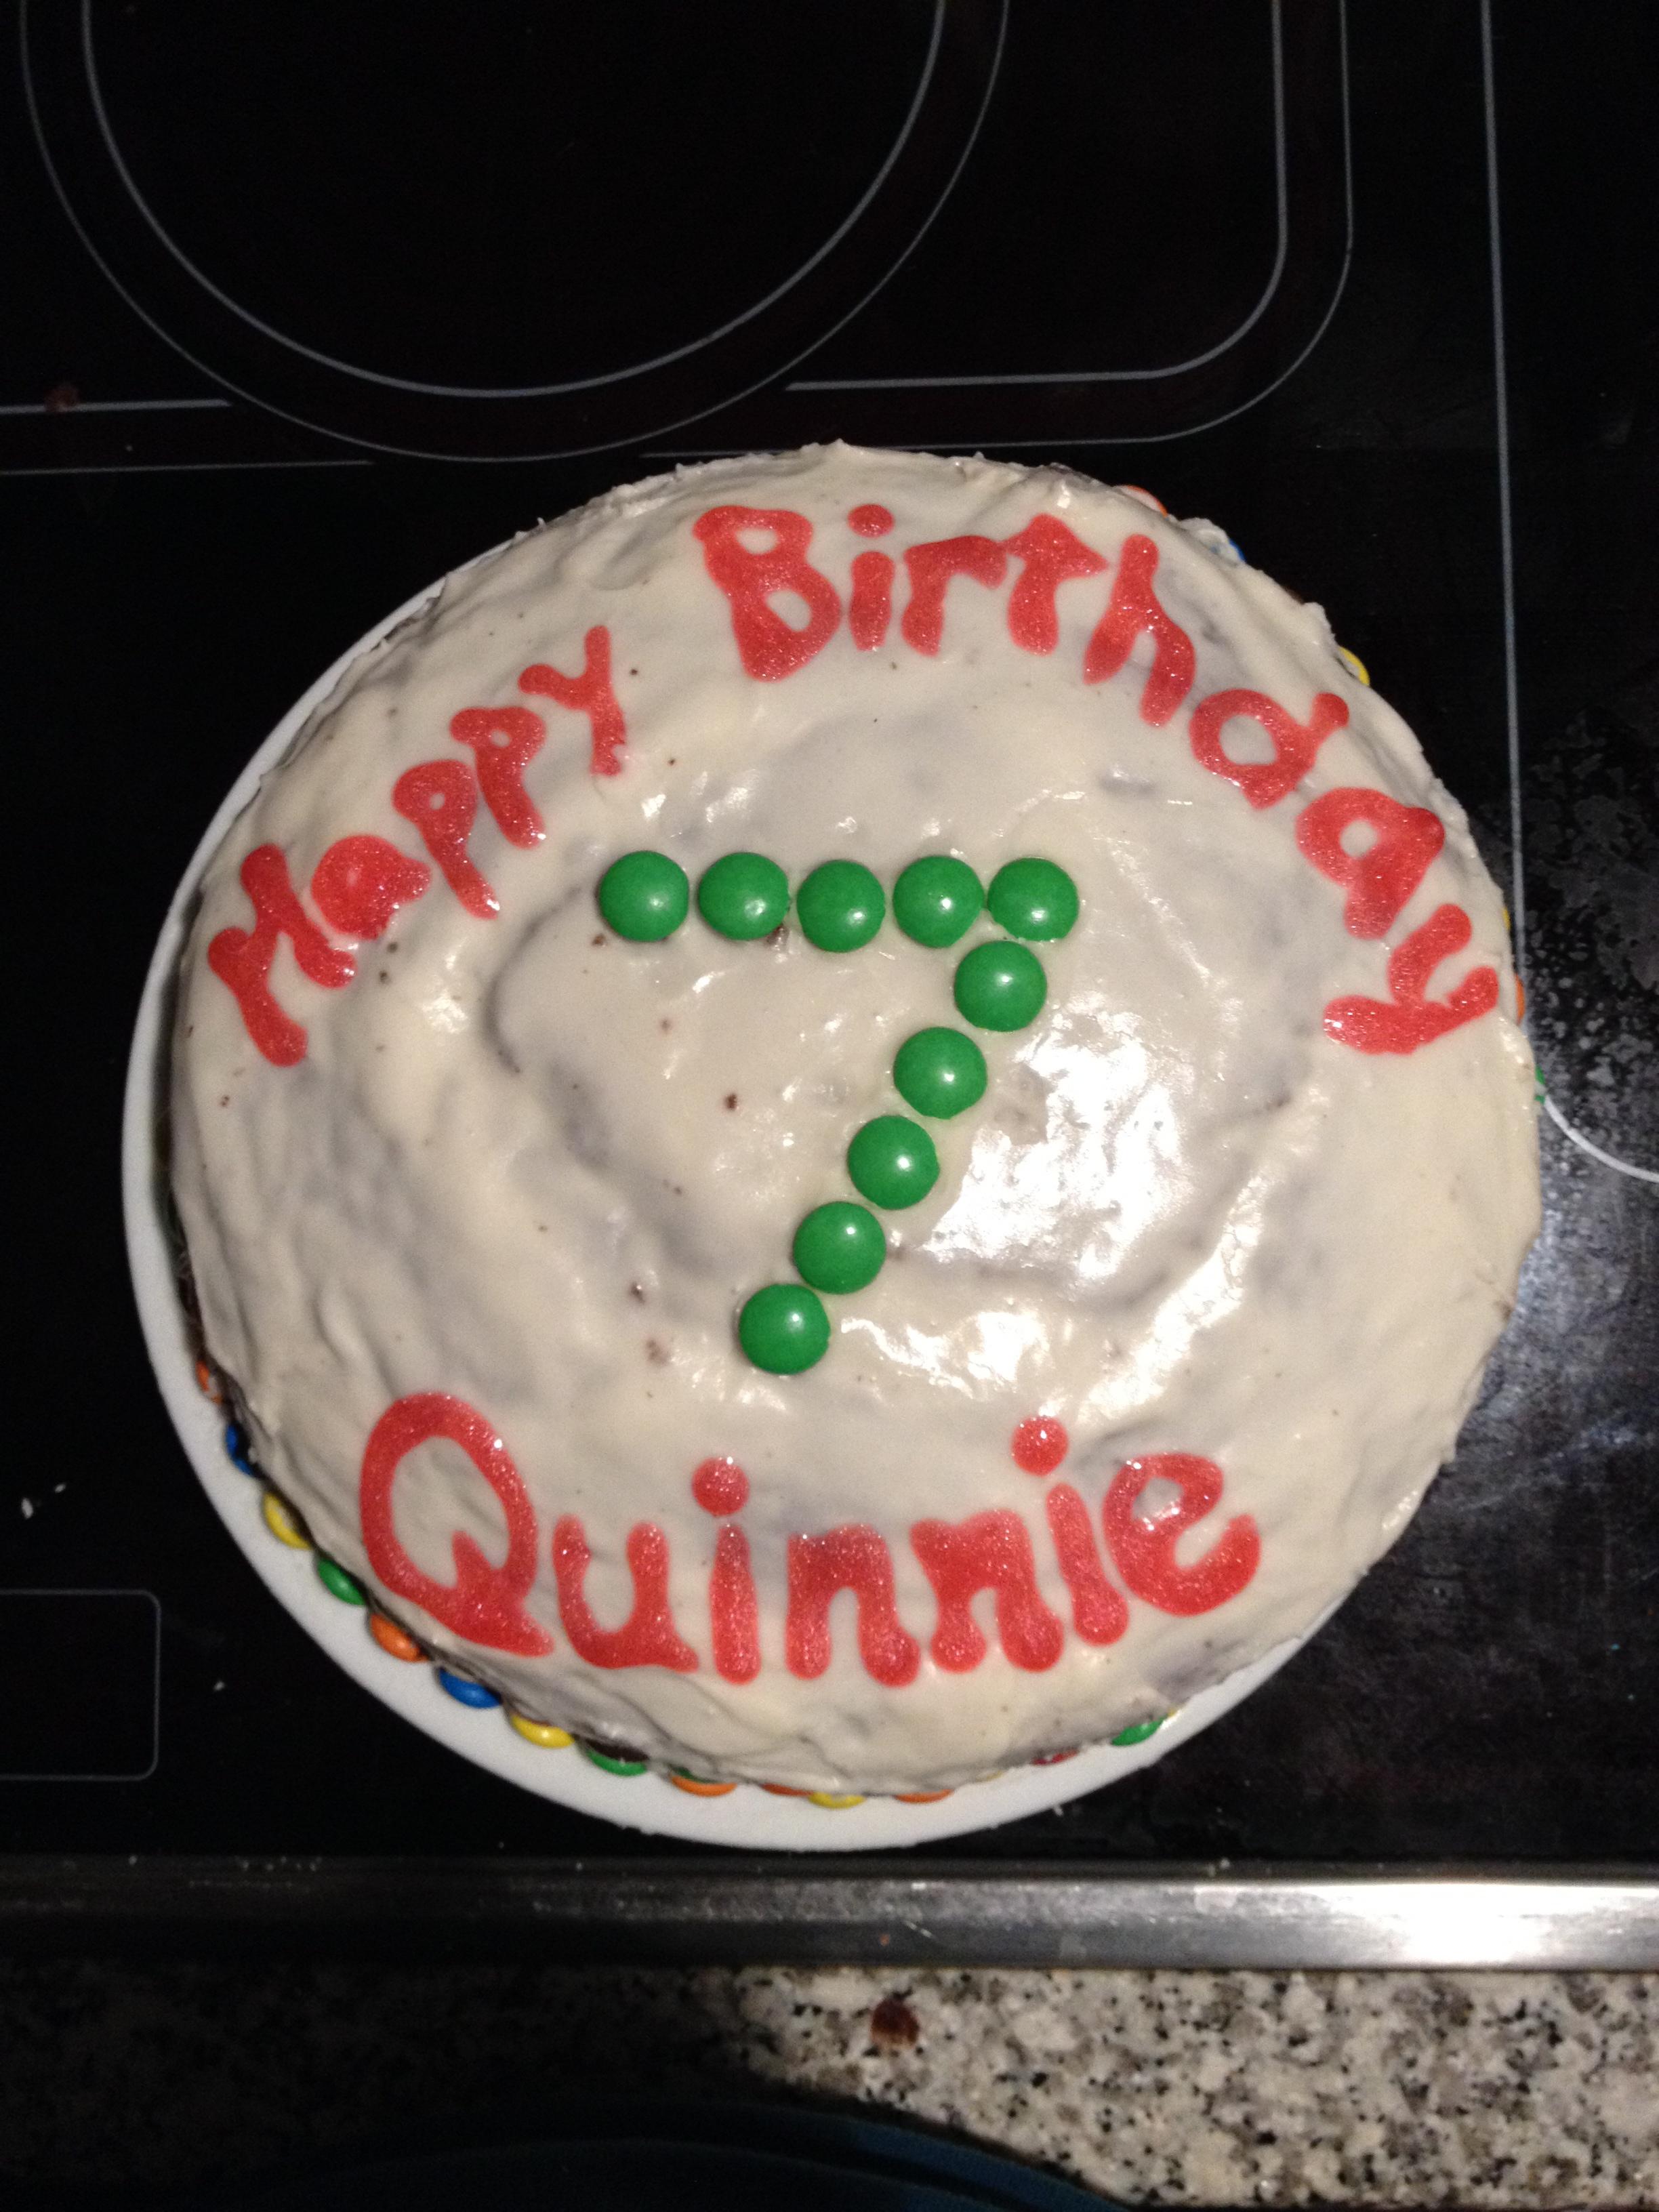 Quinnies 7th Birthday Ribbons Undone